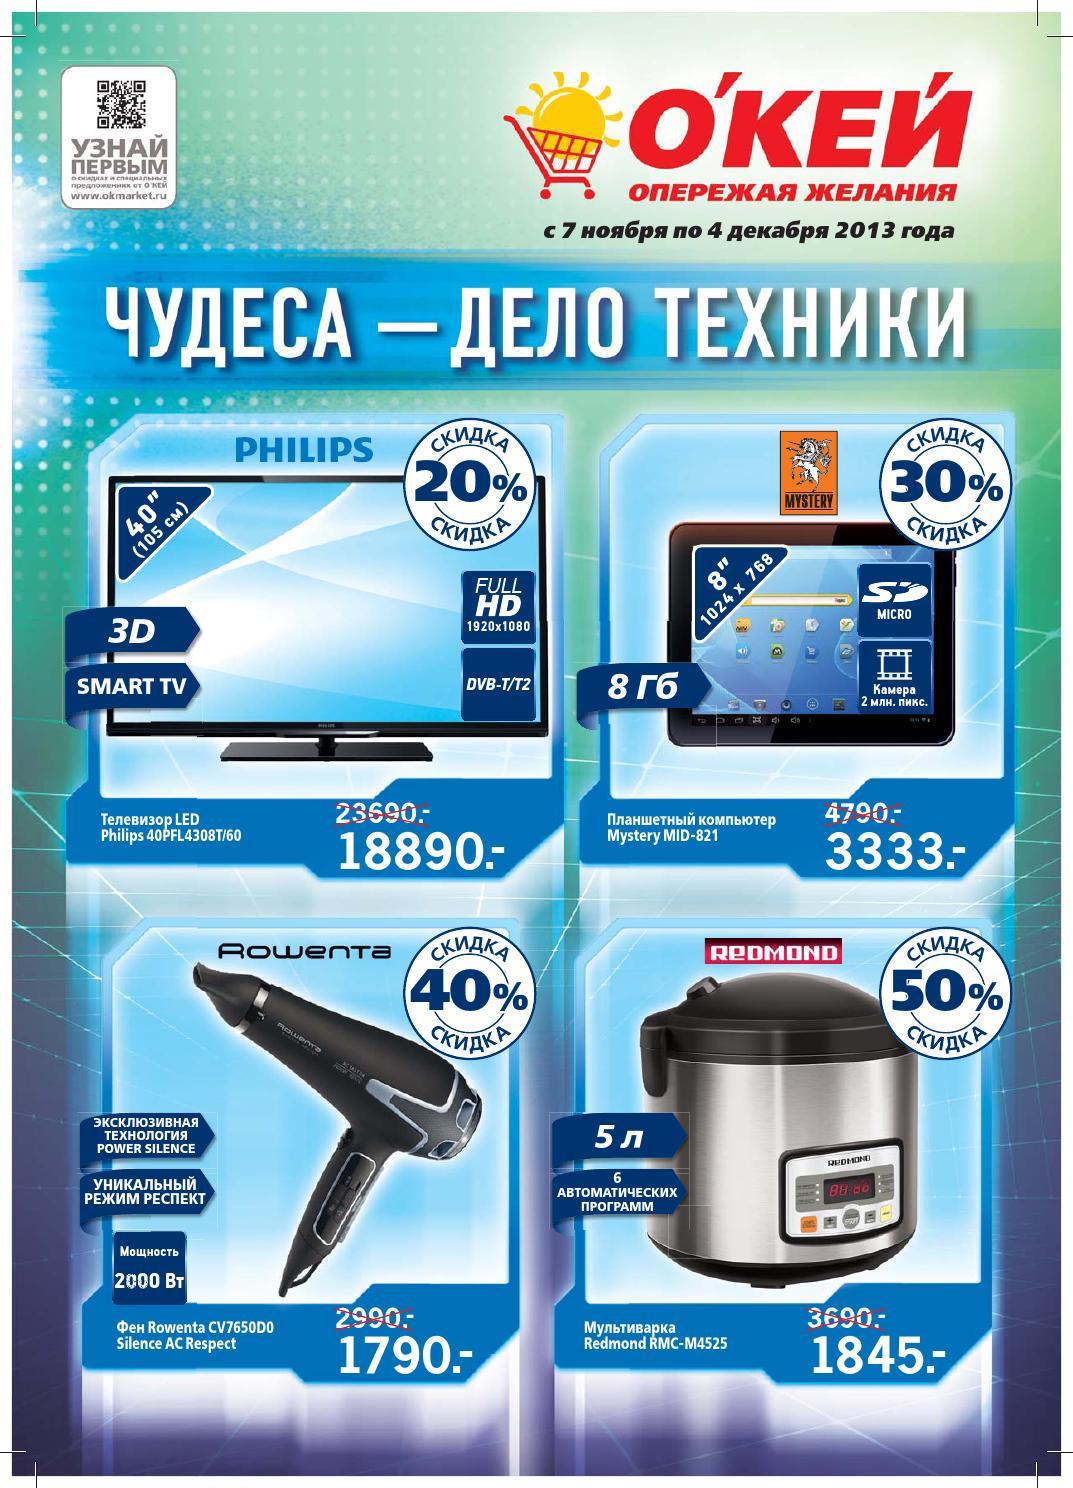 Promo Harga Lg Optimus L5 Ii Dual E 455 4gb Indigo Black Update 2018 K10 K430dsy 16gb Hitam Biru Ok 2013 By Rasprodaga24 Issuu